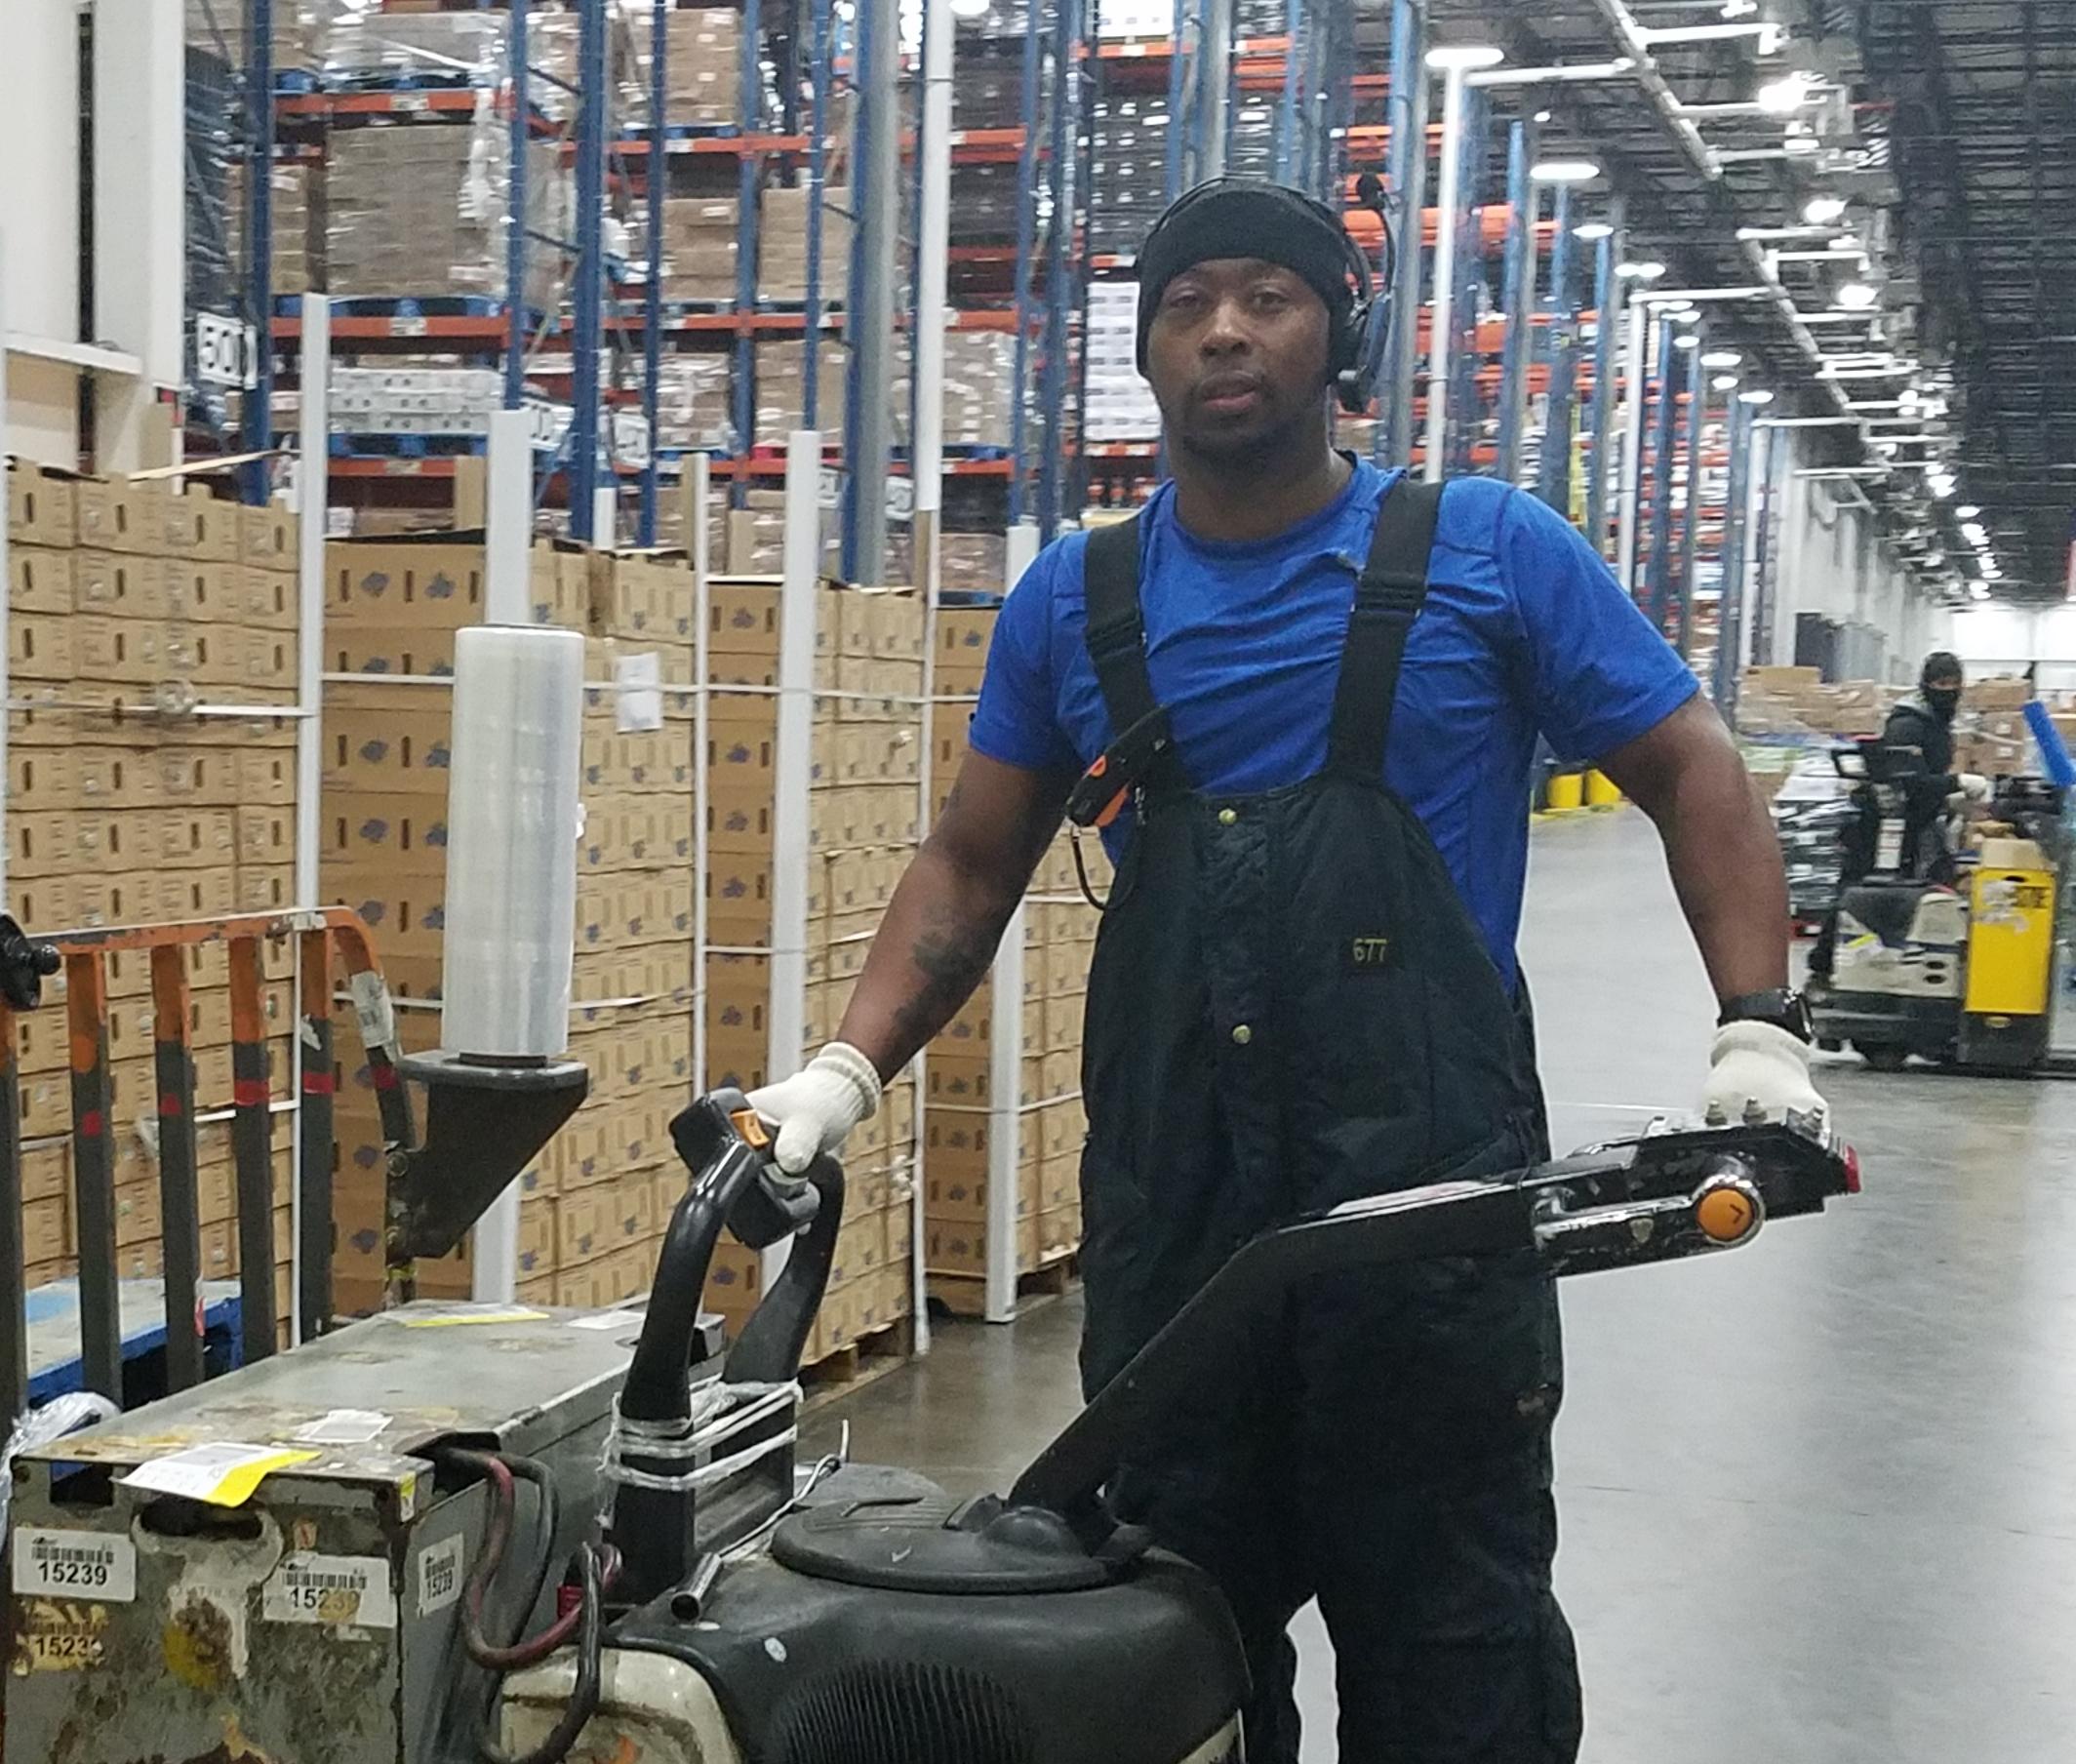 kroger dc employee - kroger great lakes distribution center jobs